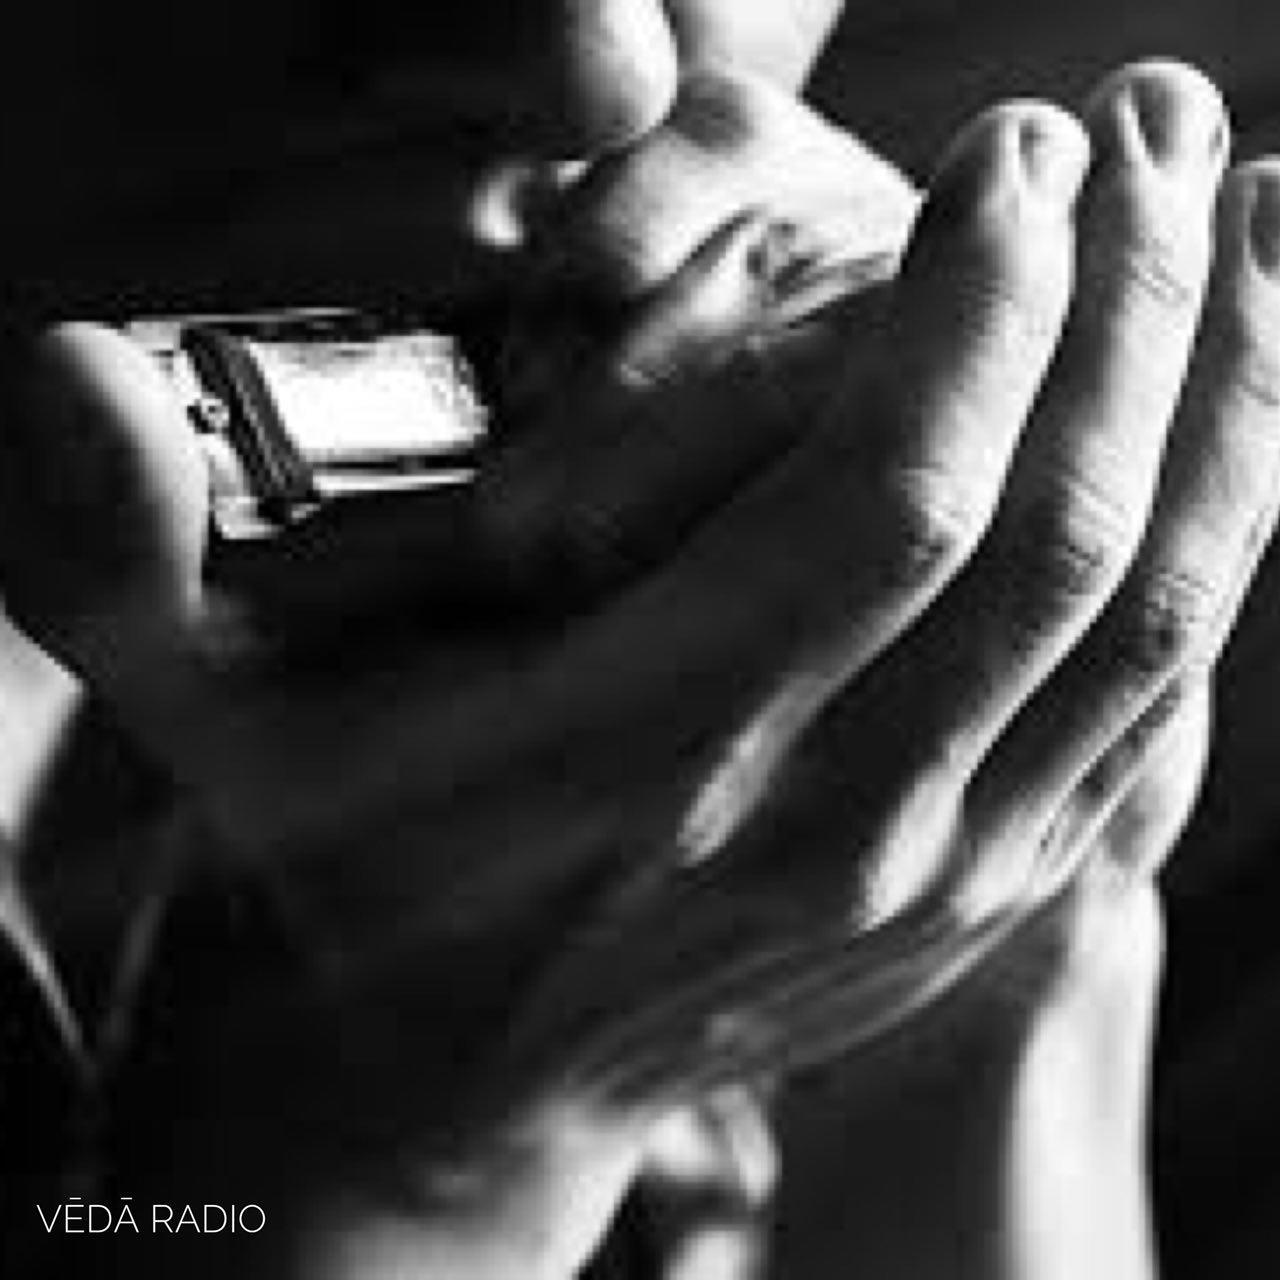 Harmonica   Veda Radio mp3 image رادیو نت هارمونیکا